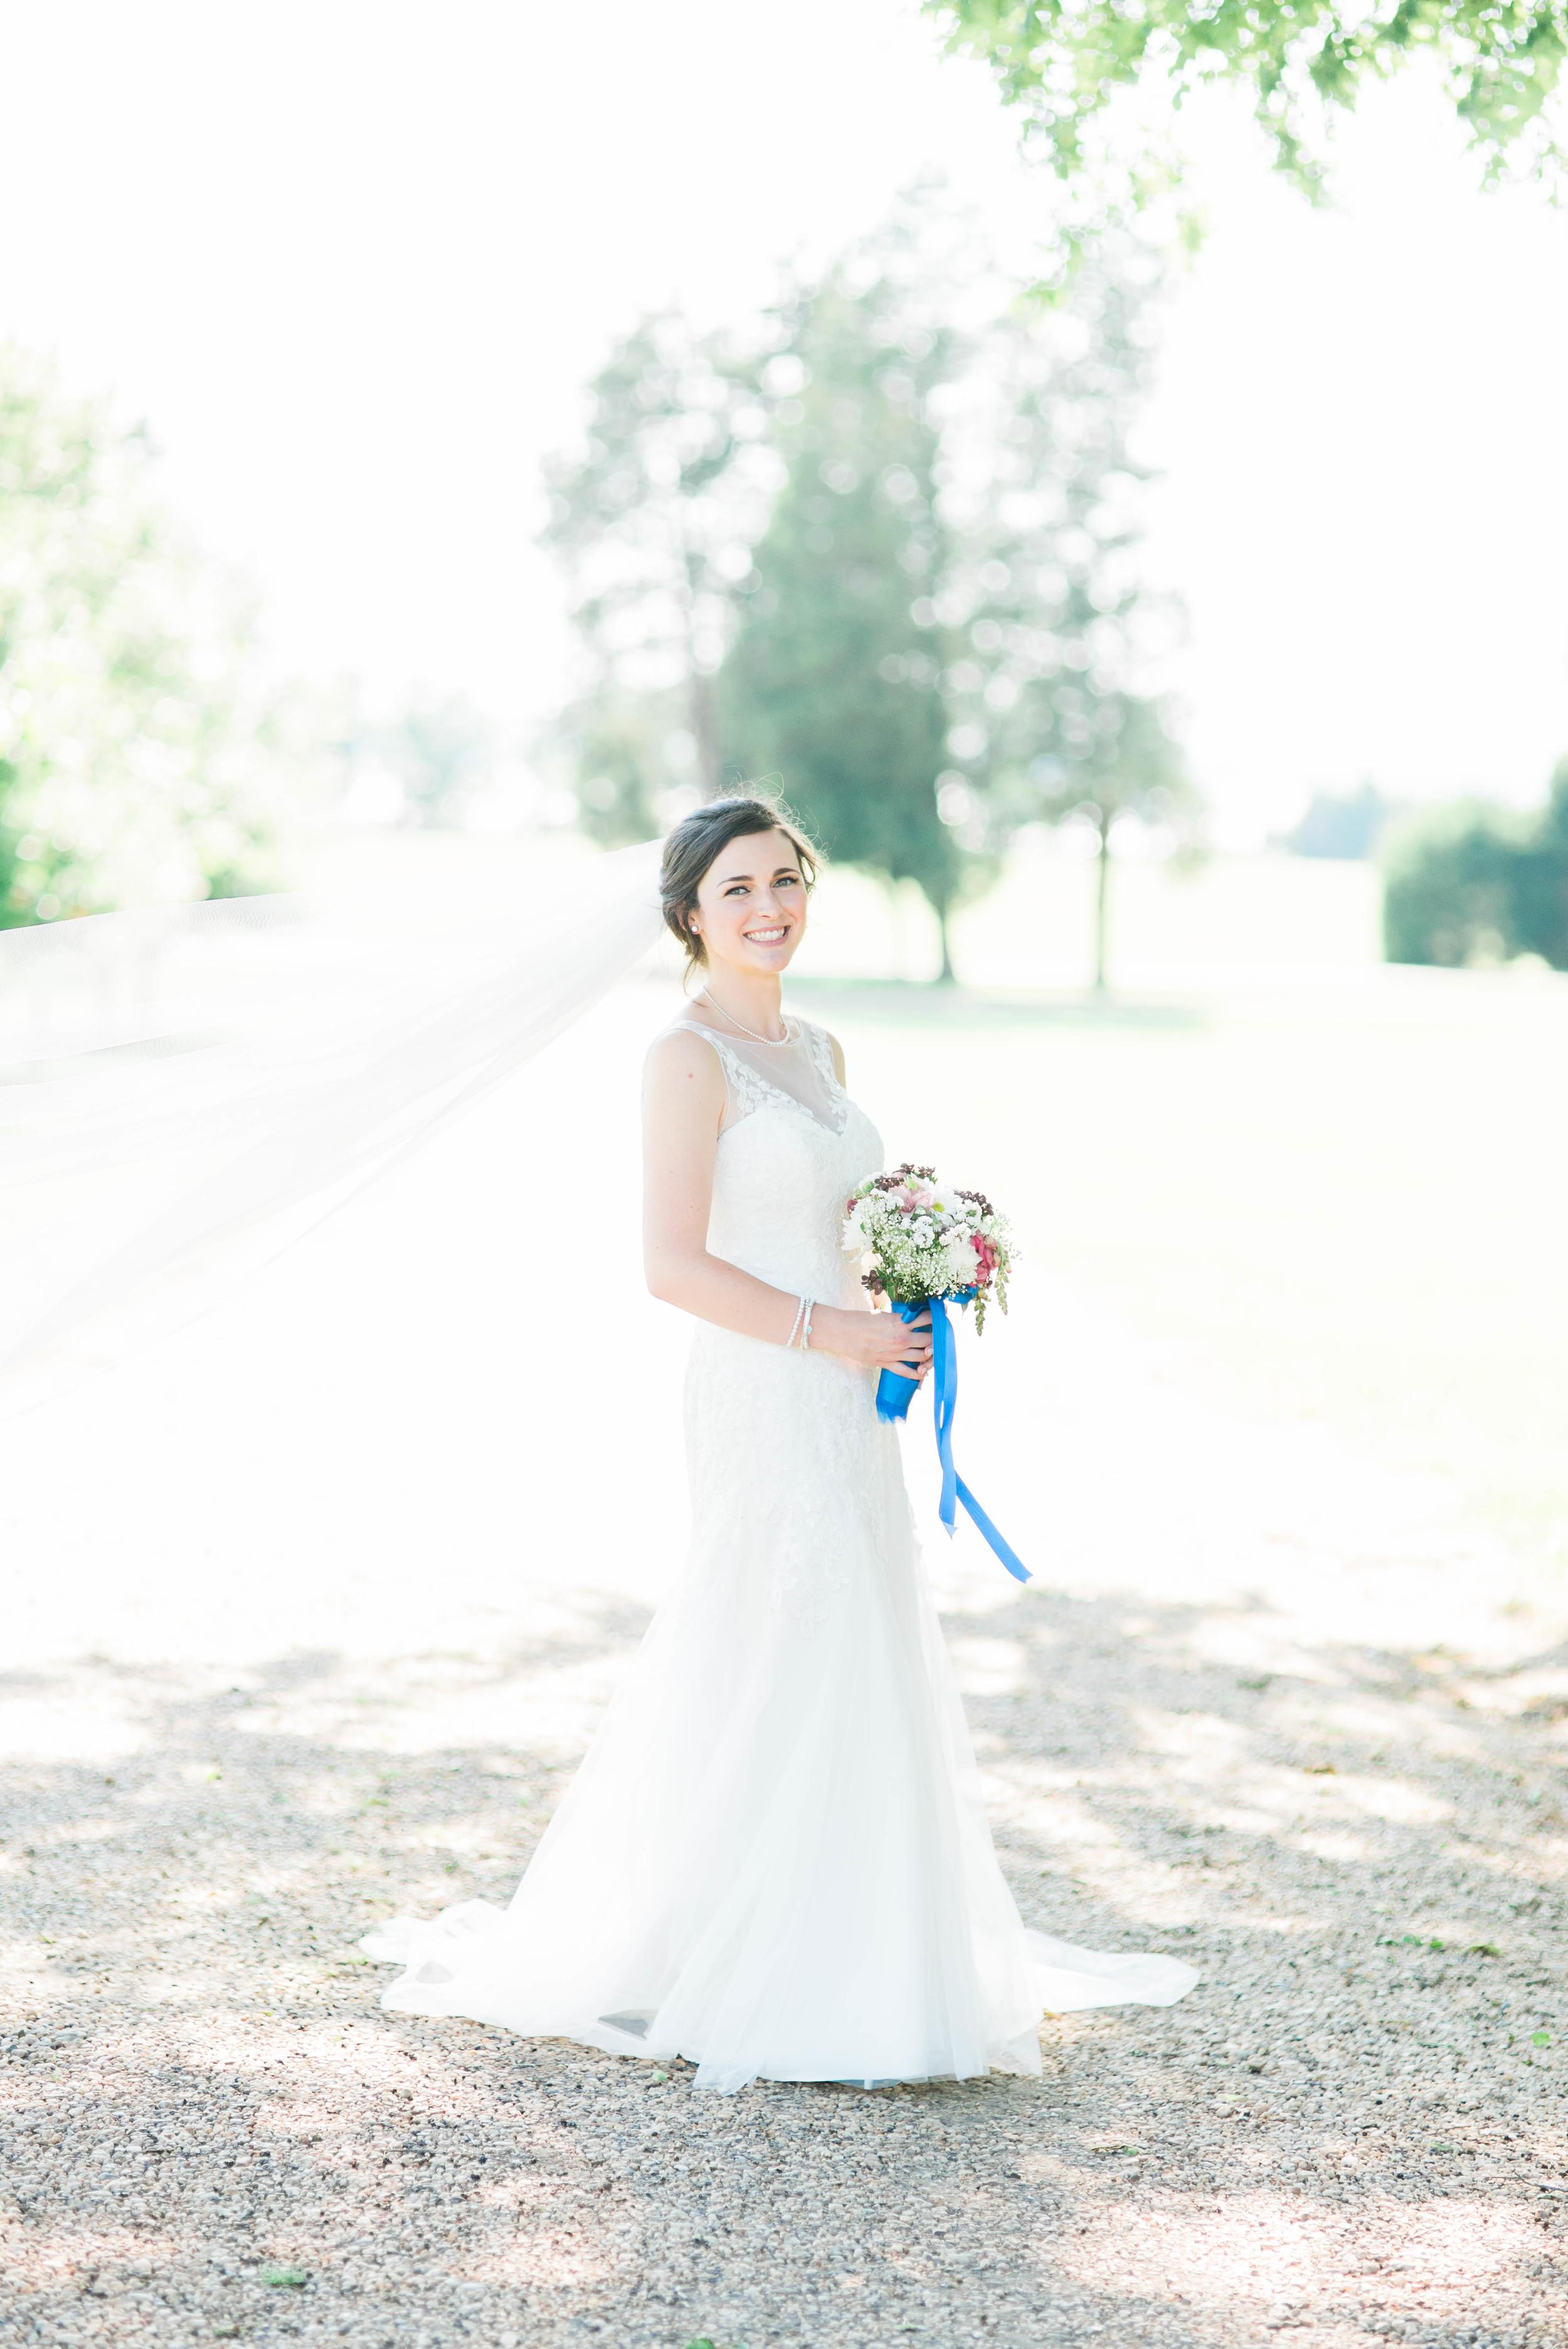 PREVIEWremowedding2016-38.jpg